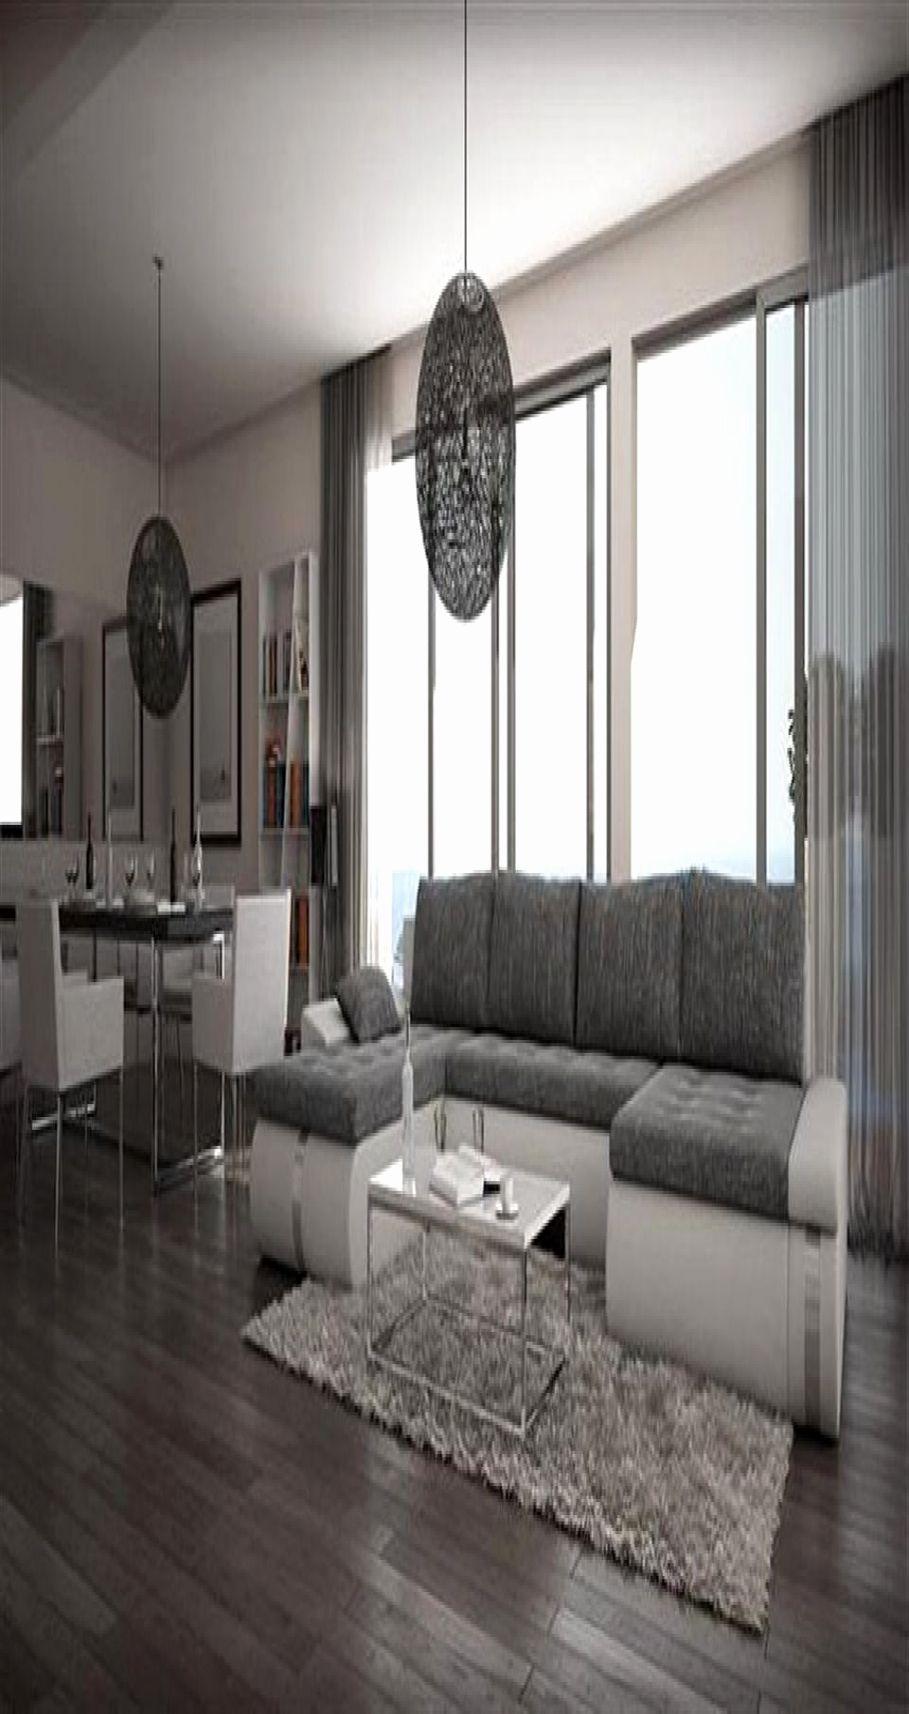 Blaue Wandfarbe Wohnzimmer Frisch Die Graue Wand Grau Als Graue Wand Wohnzimmer In 2020 Living Room Wall Designs Small Living Room Decor Gray Living Room Design